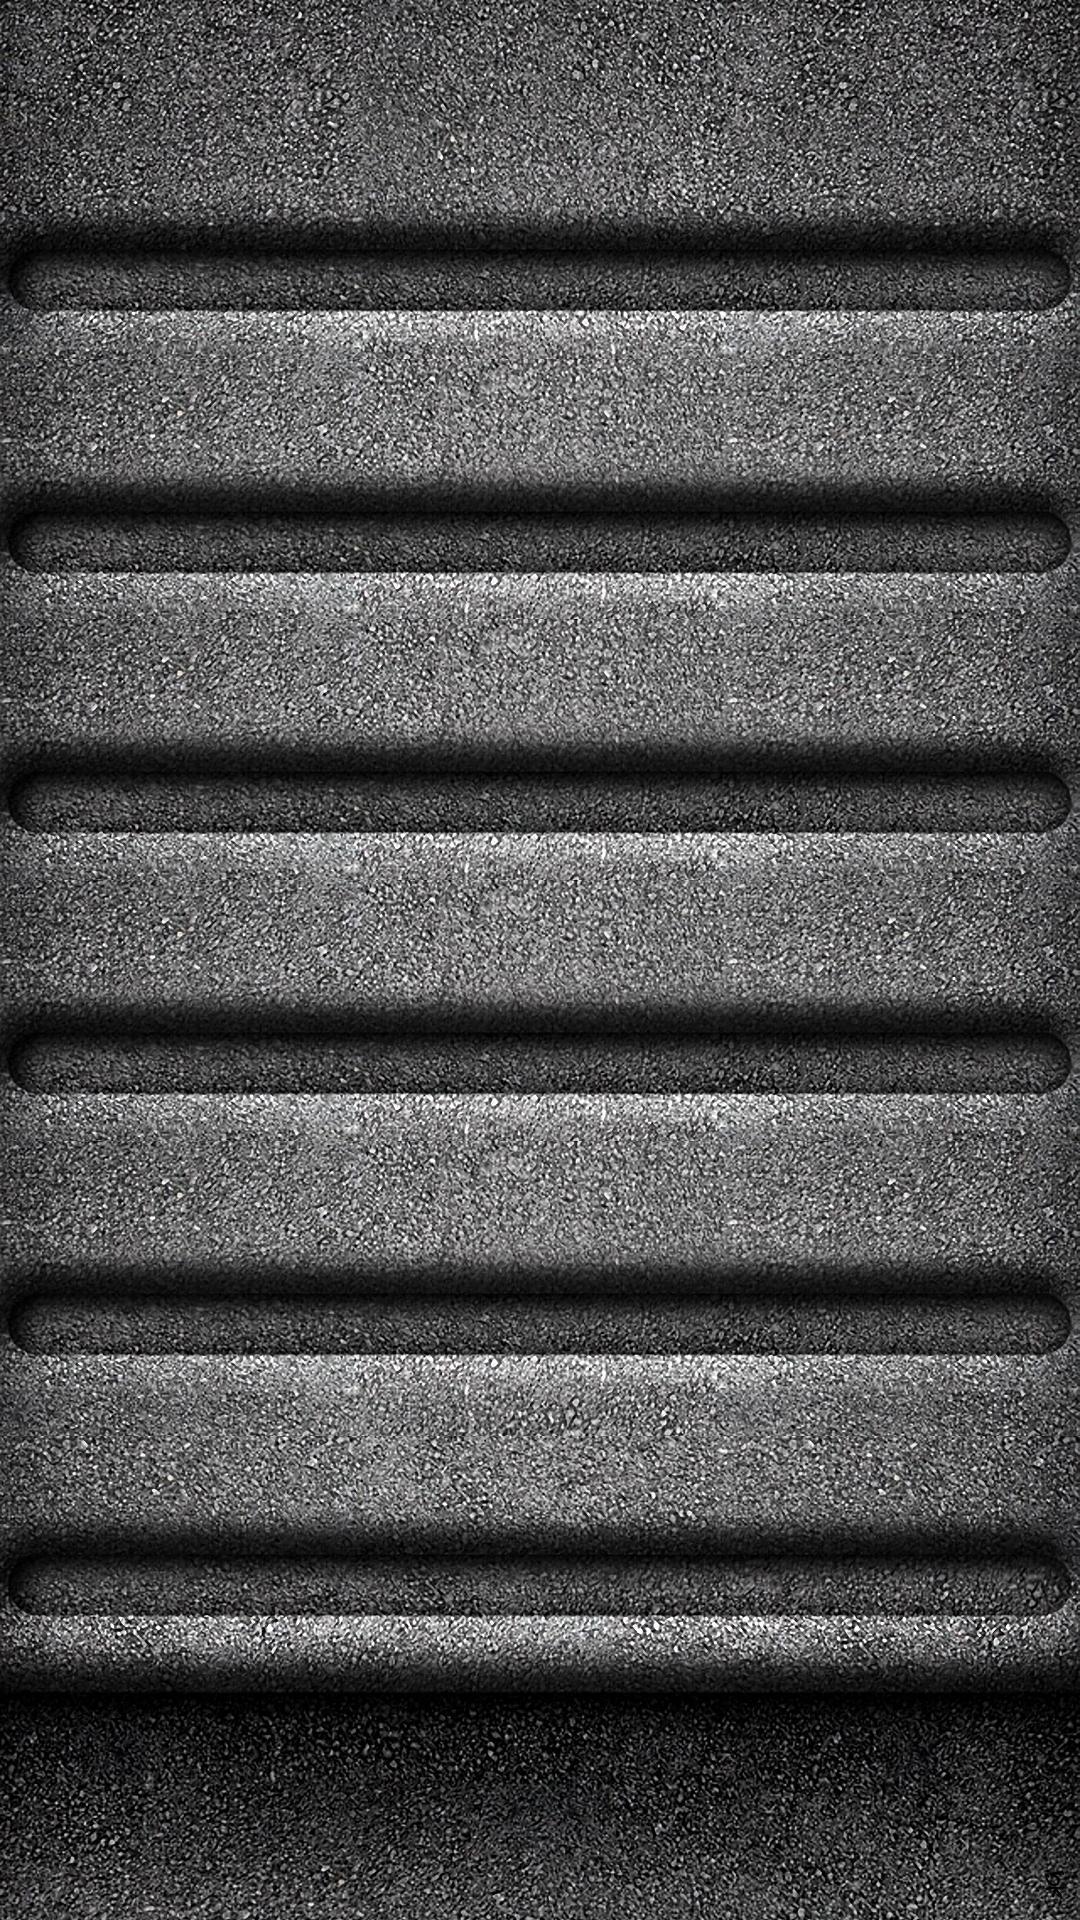 Stone Iphone Wallpaper Iphone Wallpaper